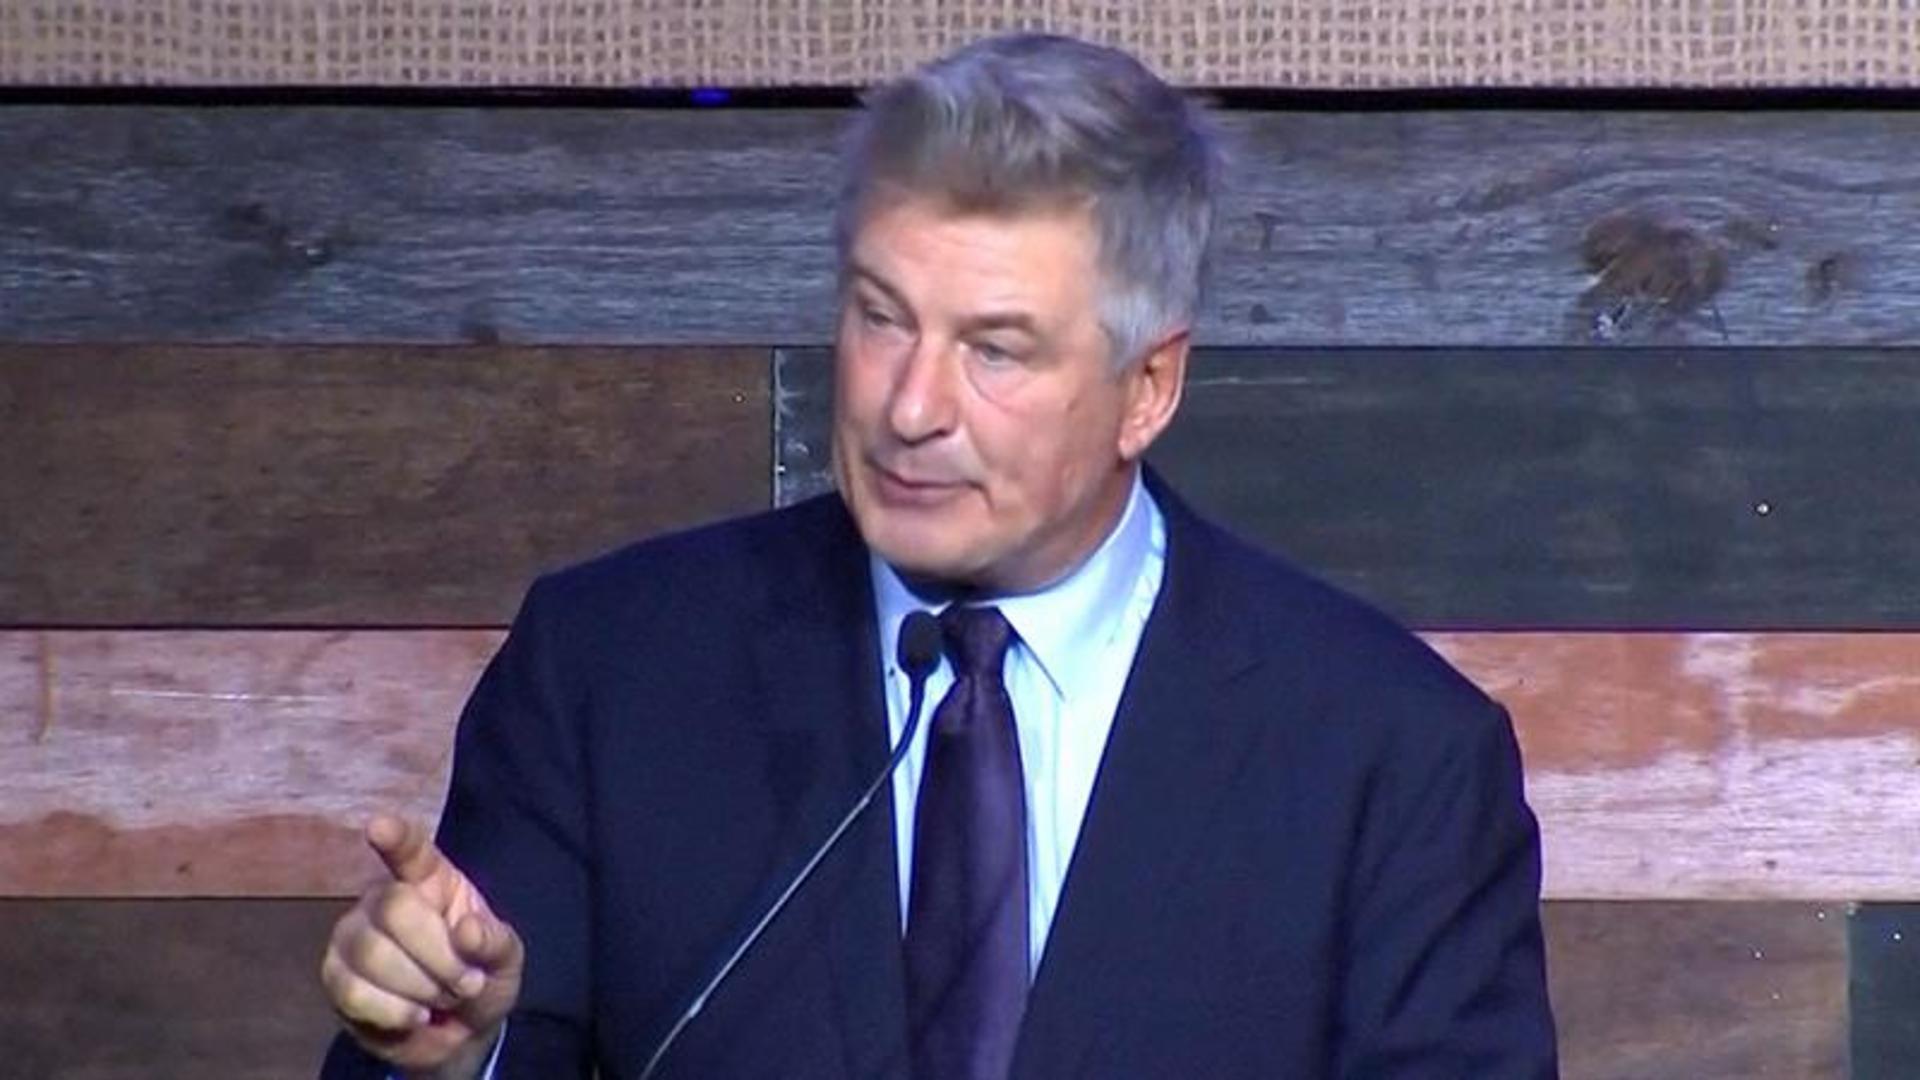 NRATV Host On 'Fox & Friends': Alec Baldwin's A 'Deranged Lunatic' For GOP Remarks